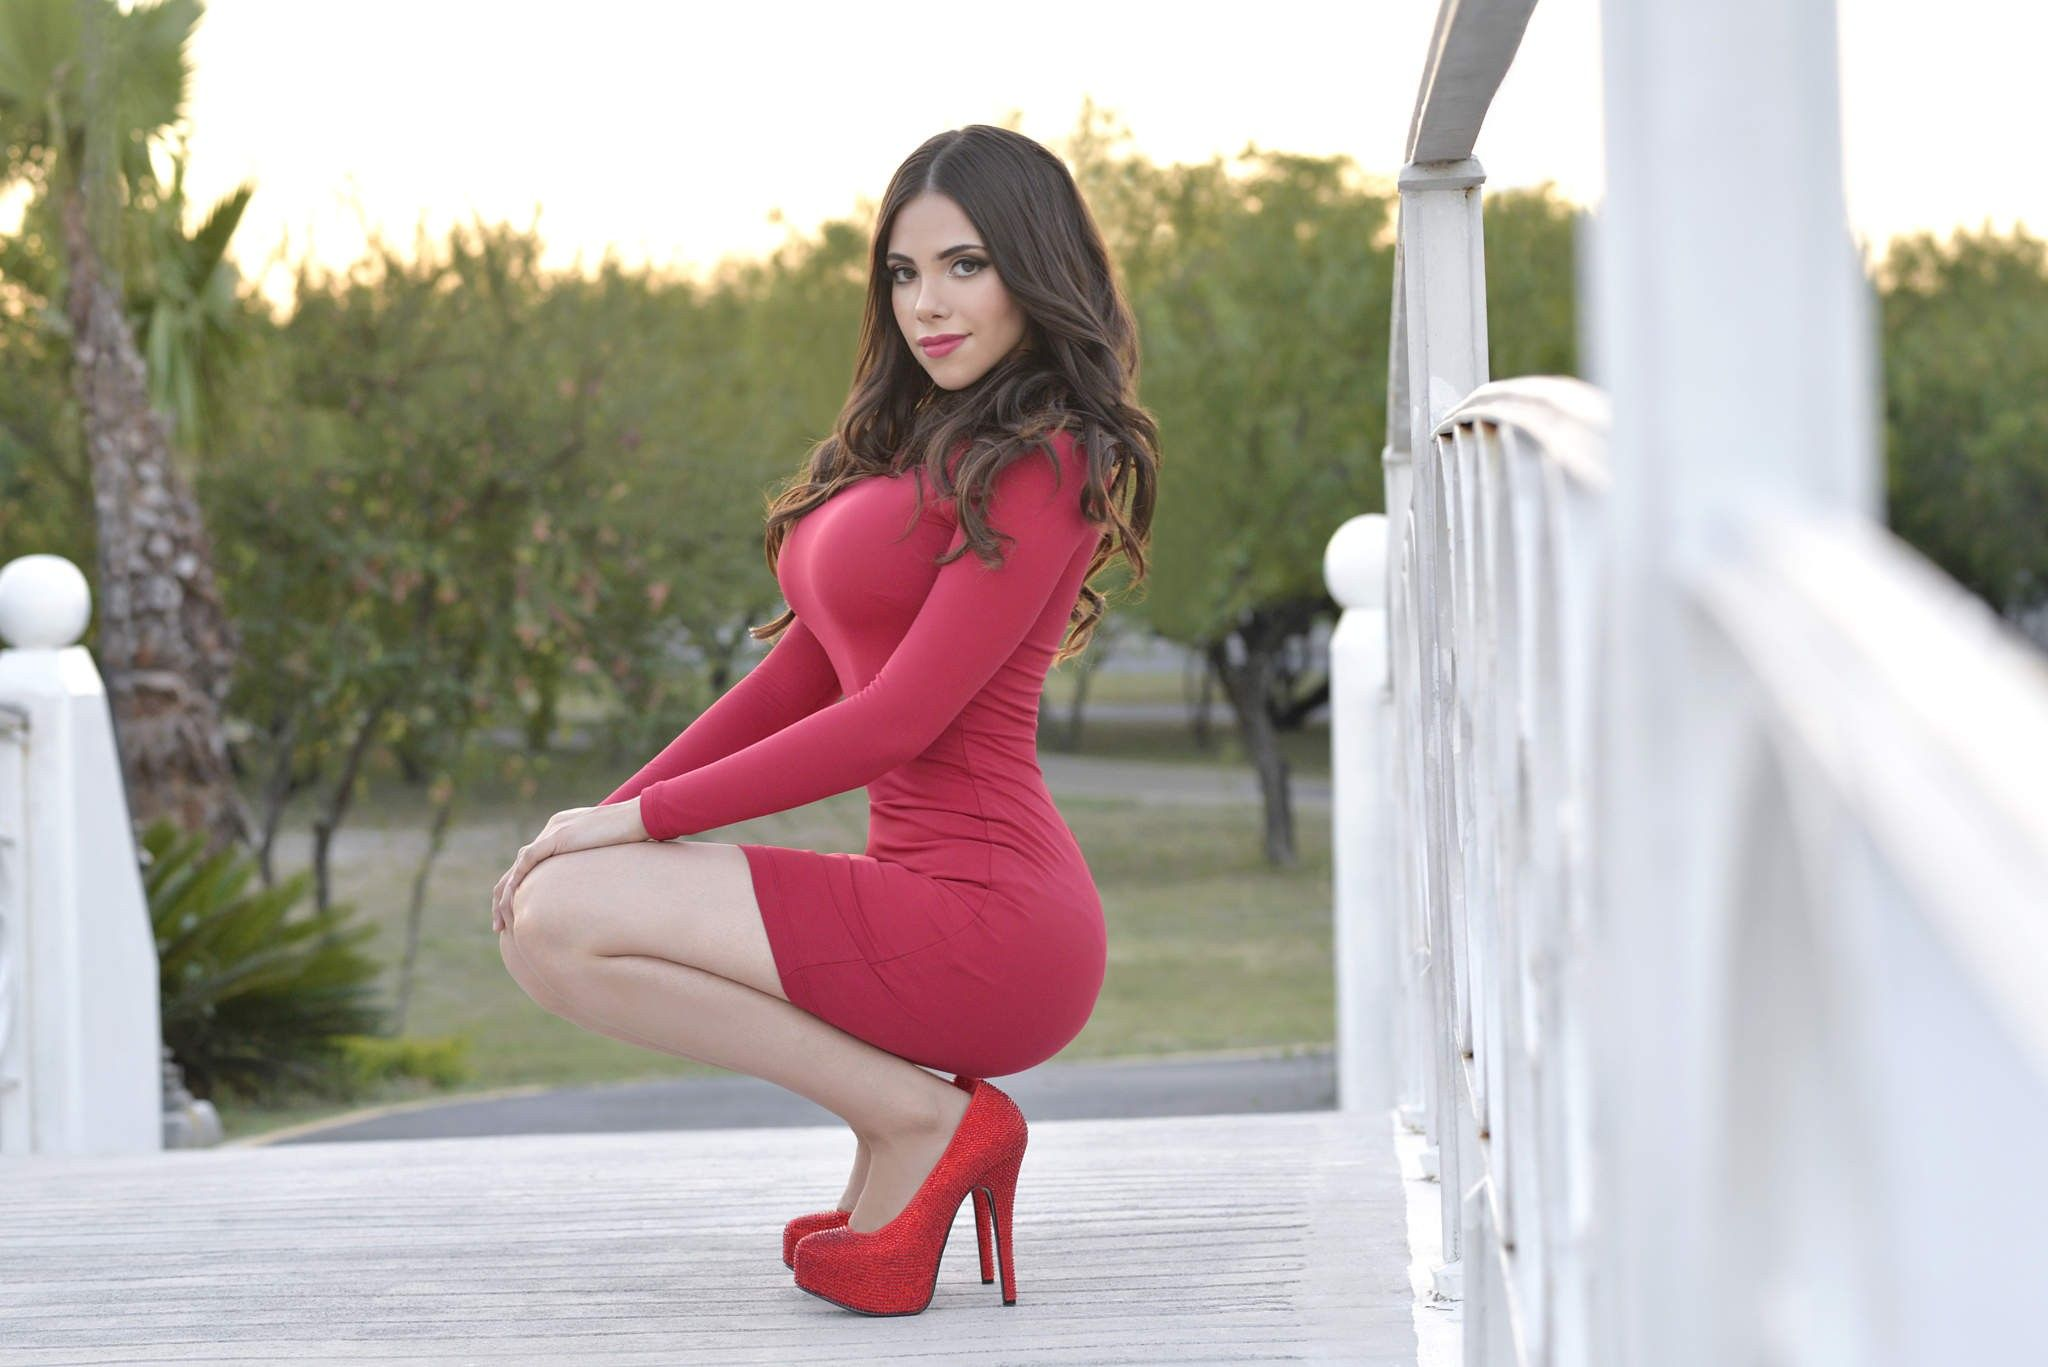 filippina women in high heels